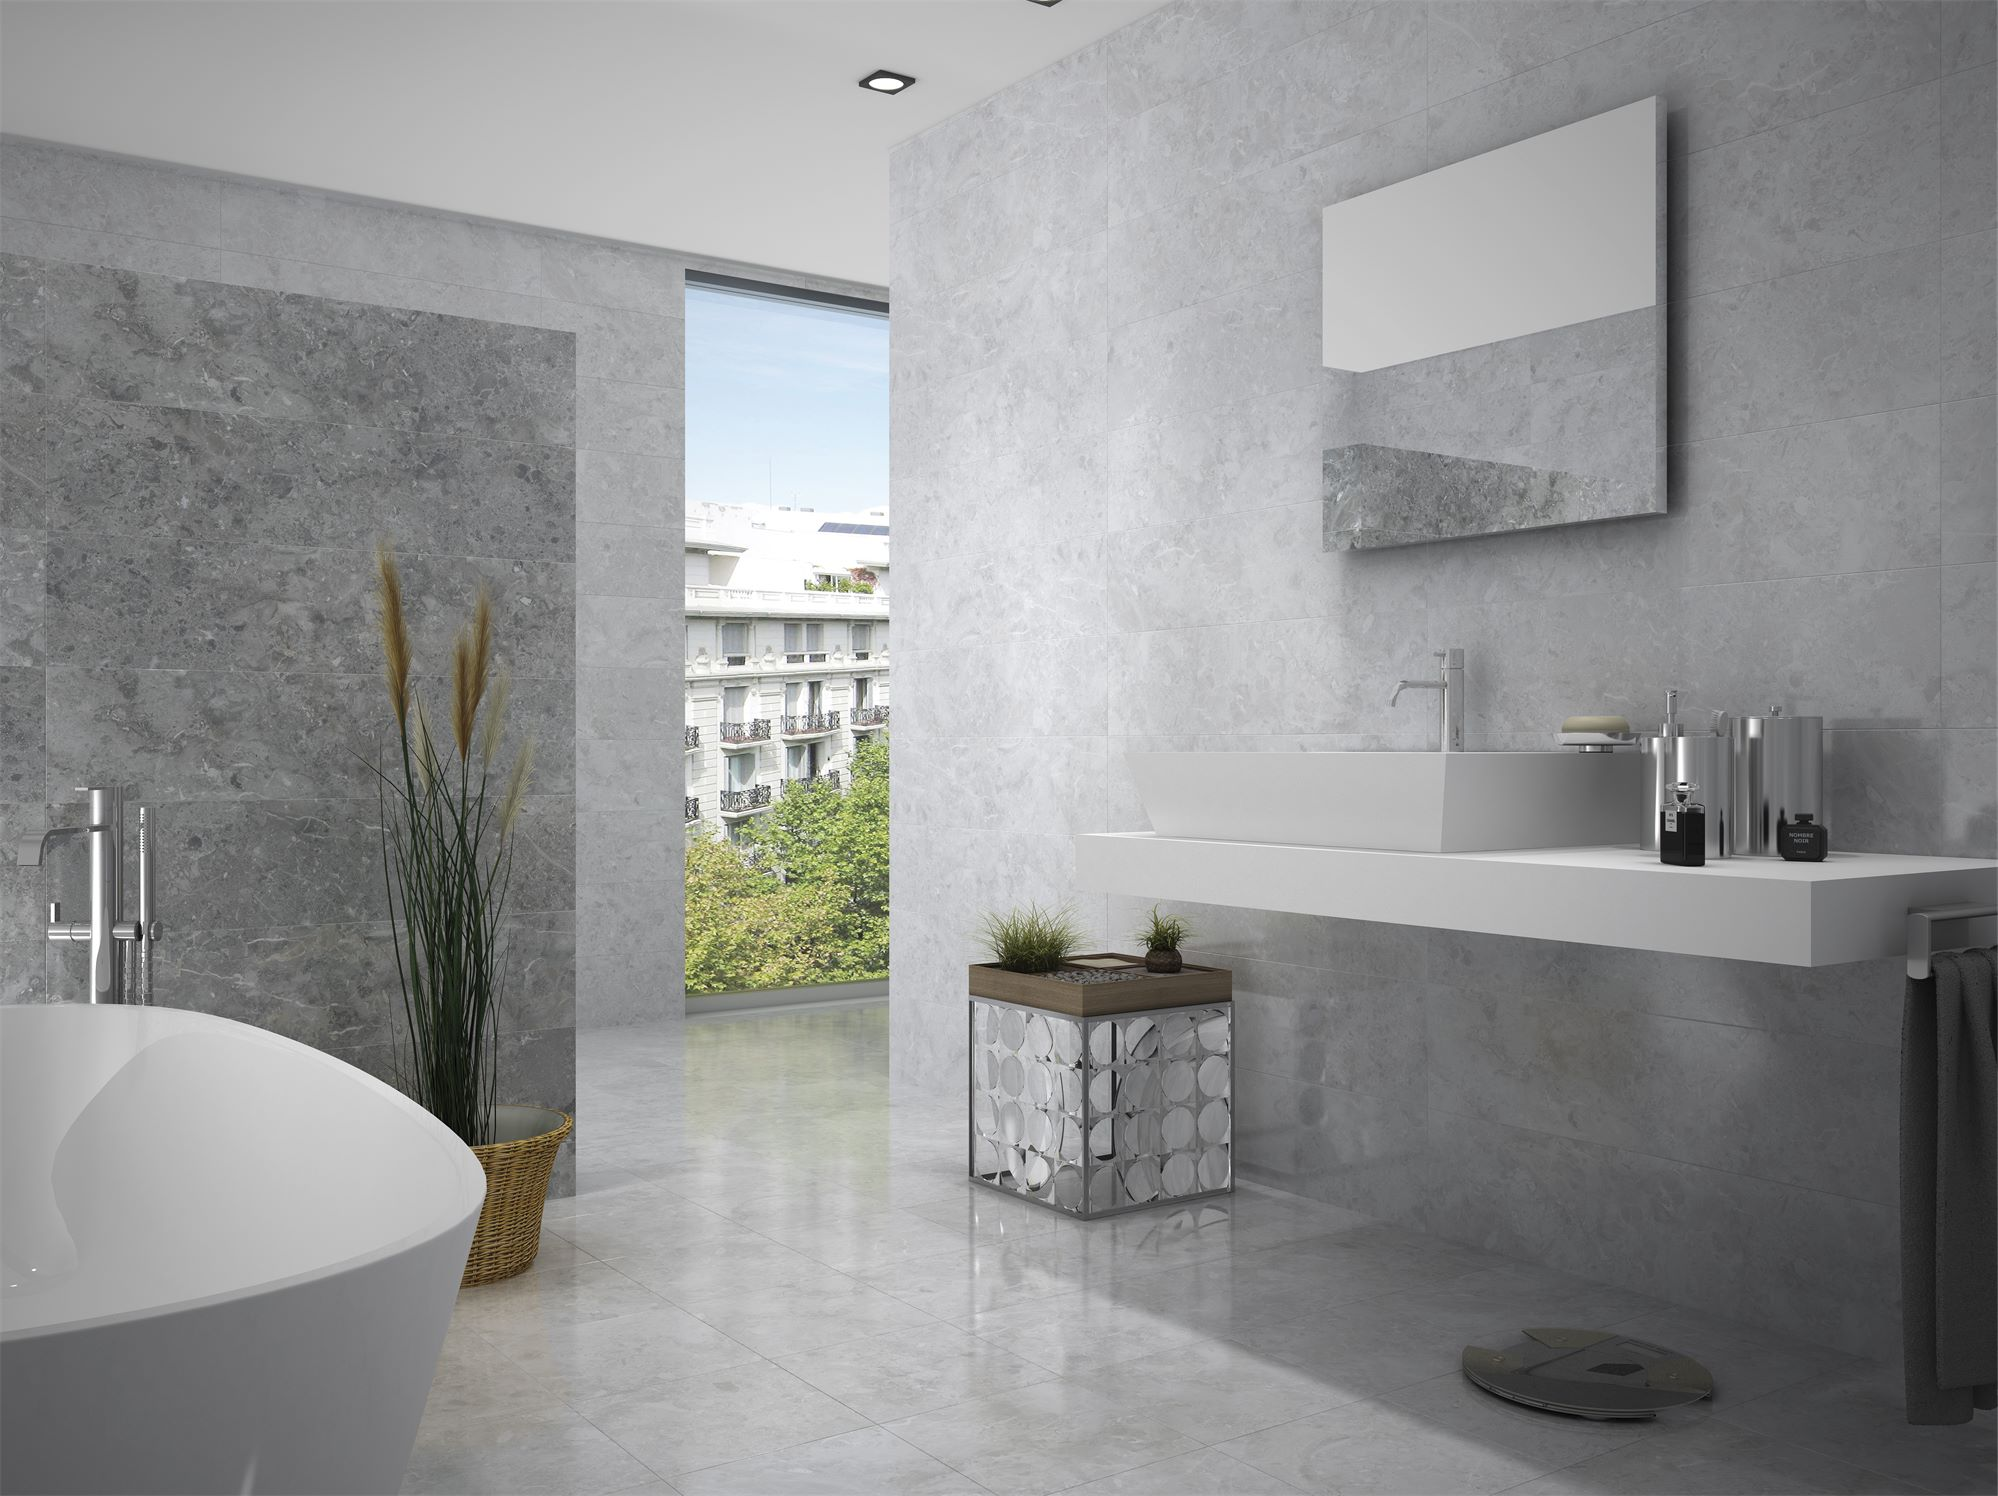 Torino blanco wall tile fylde tiles torino blanco wall tile dailygadgetfo Image collections